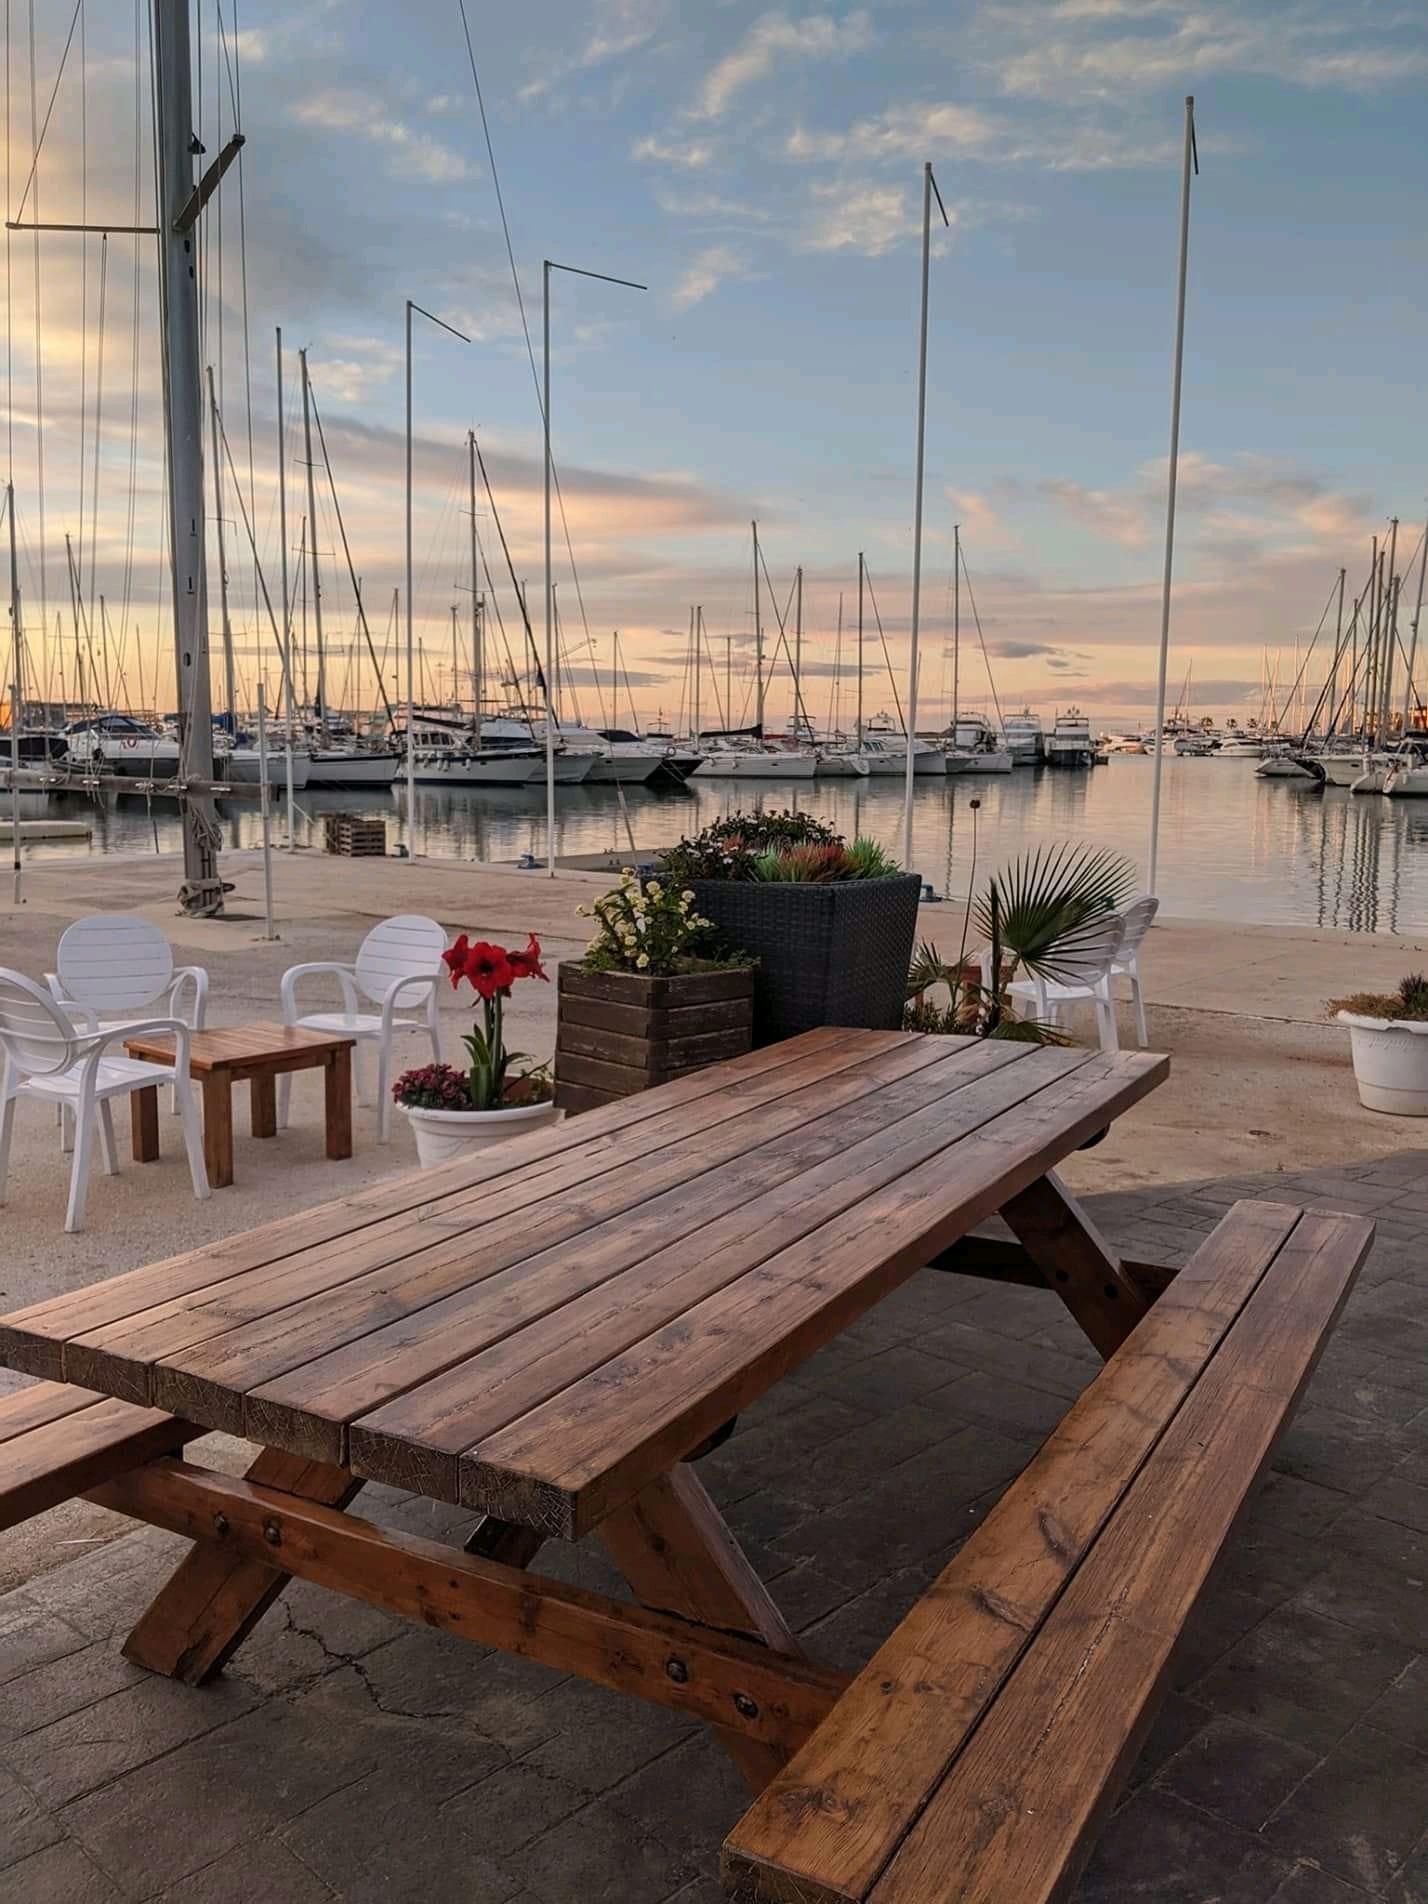 Vistas en Restaurante Balandros